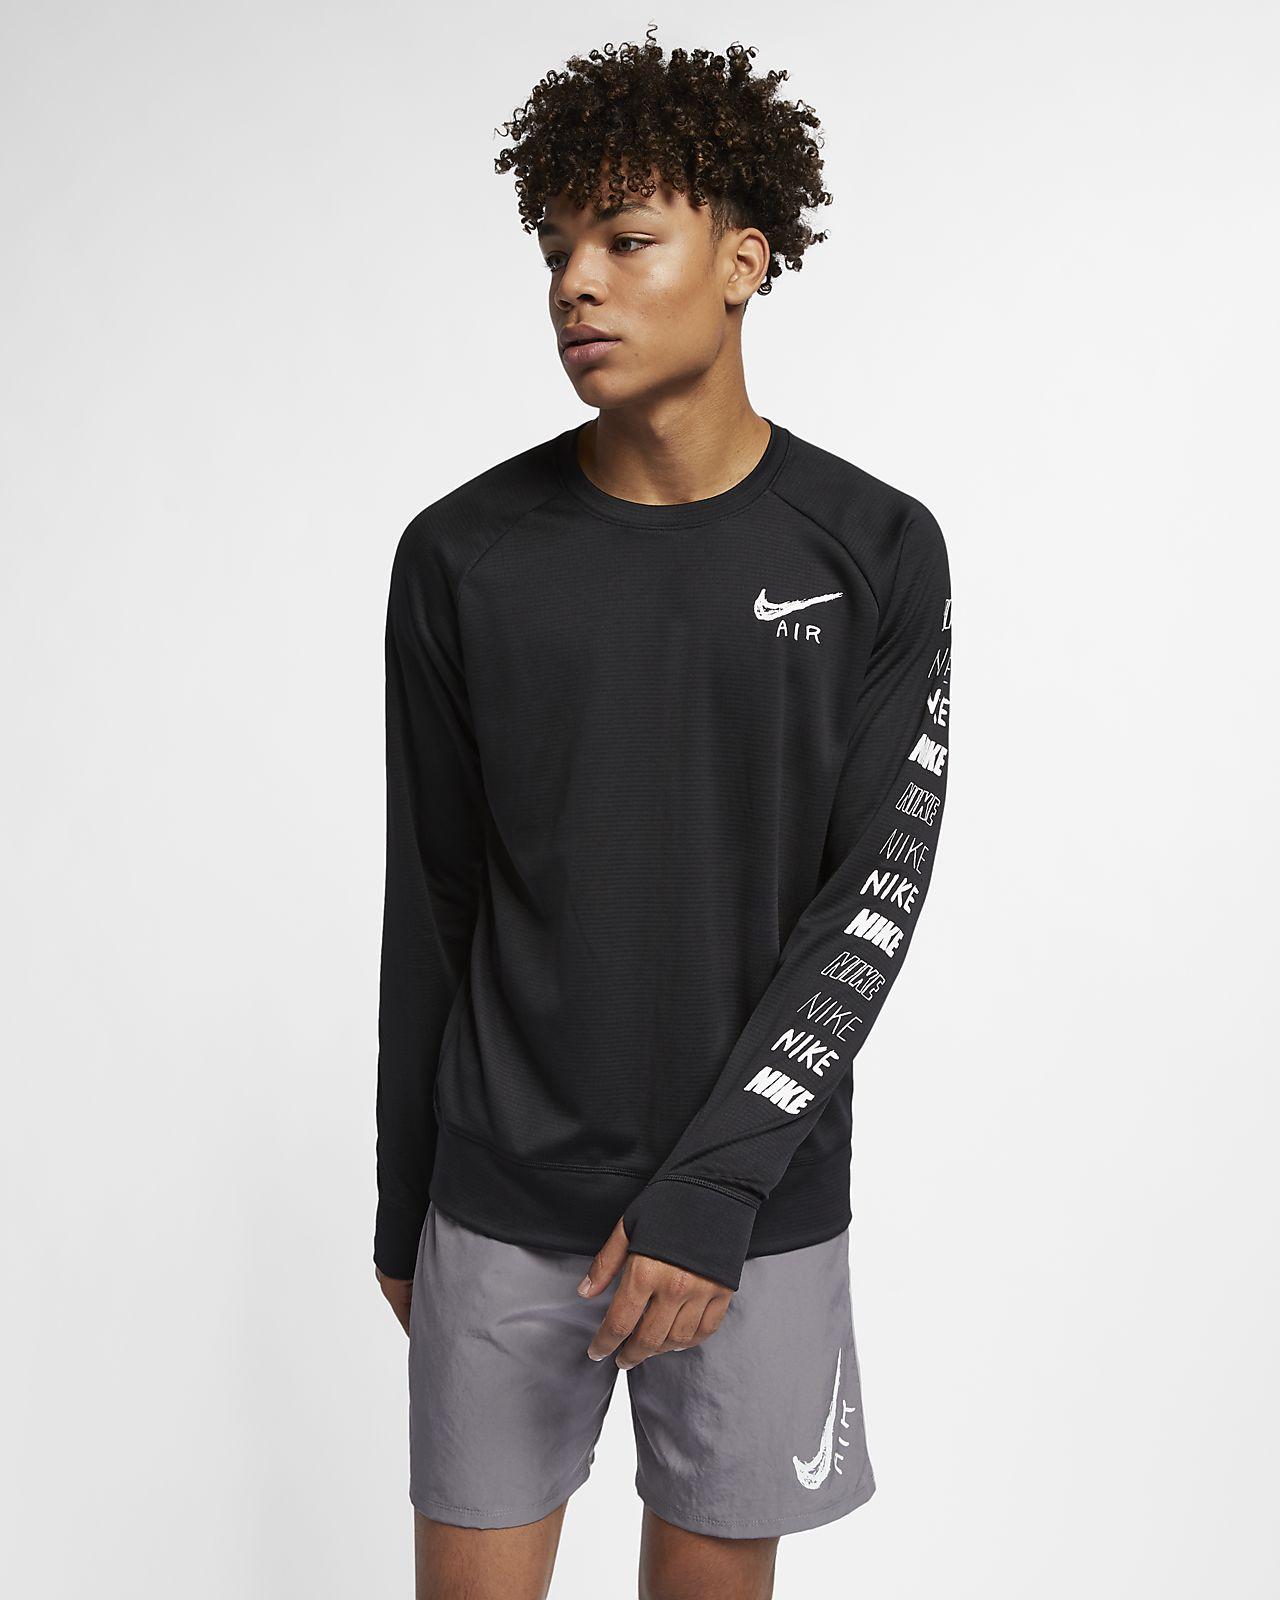 Maglia da running Nike Pacer - Uomo